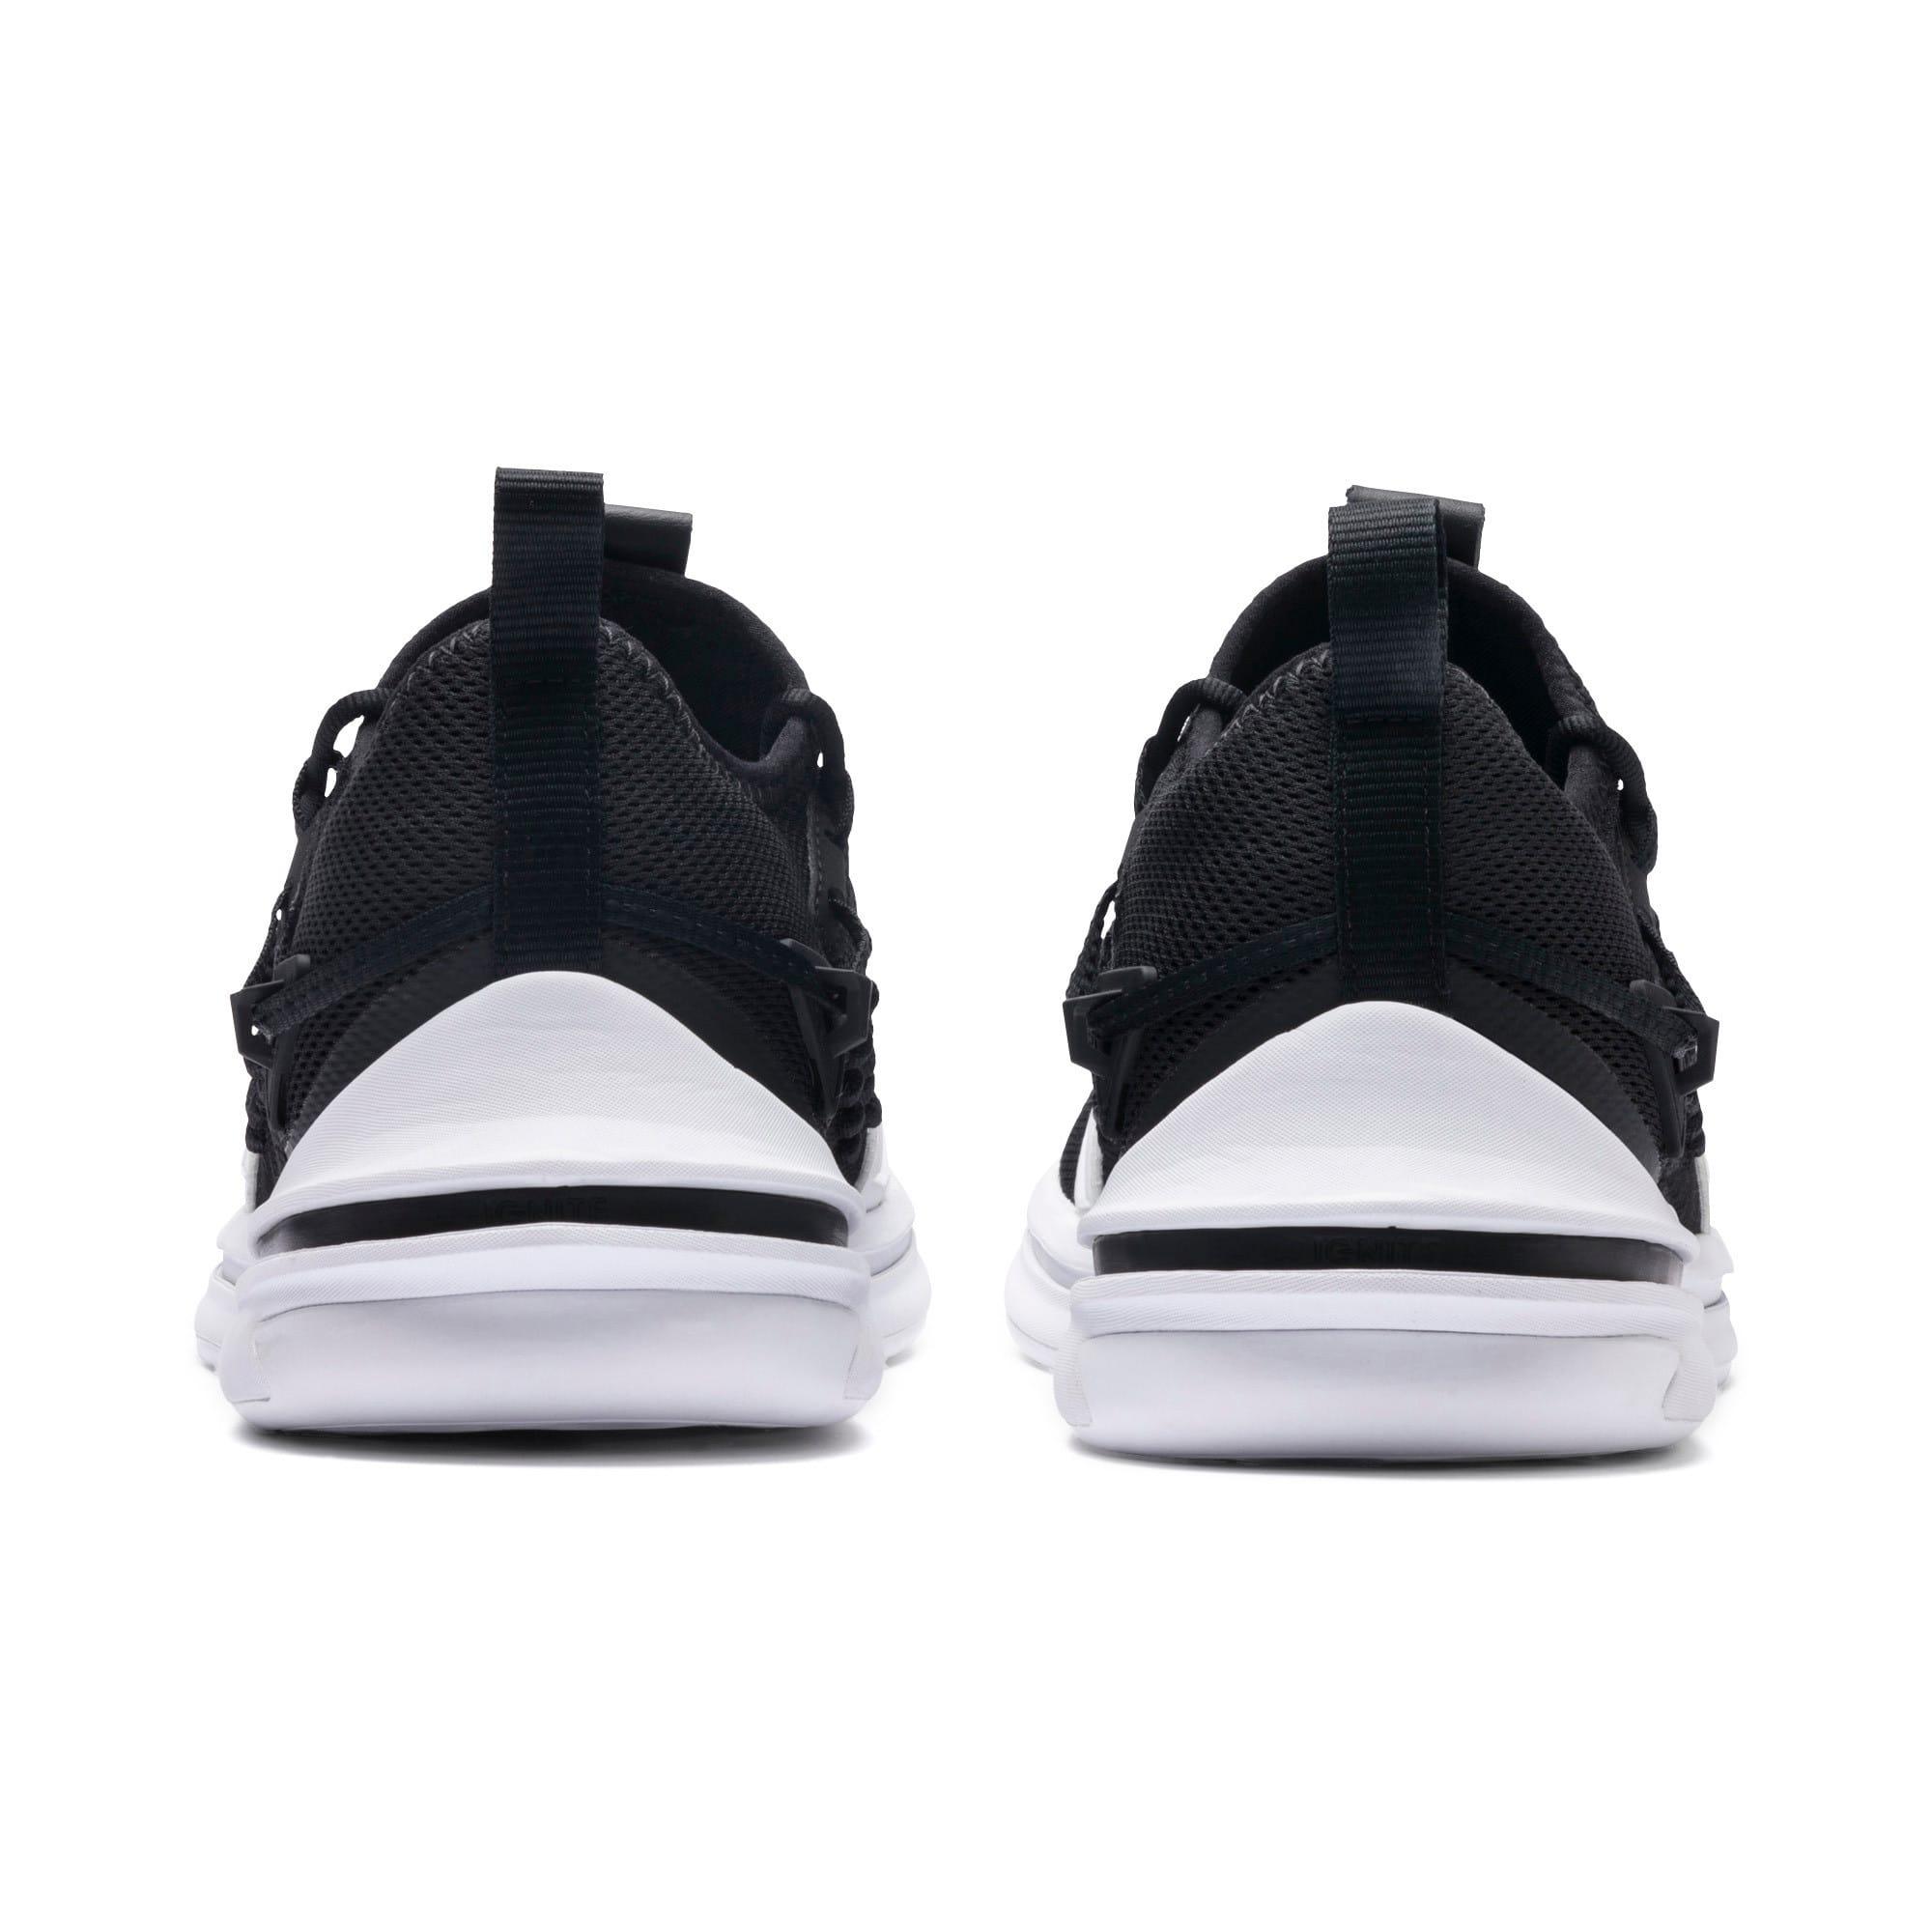 Thumbnail 5 of IGNITE Limitless SR FUSEFIT Running Shoes, Puma Black-Puma White, medium-IND